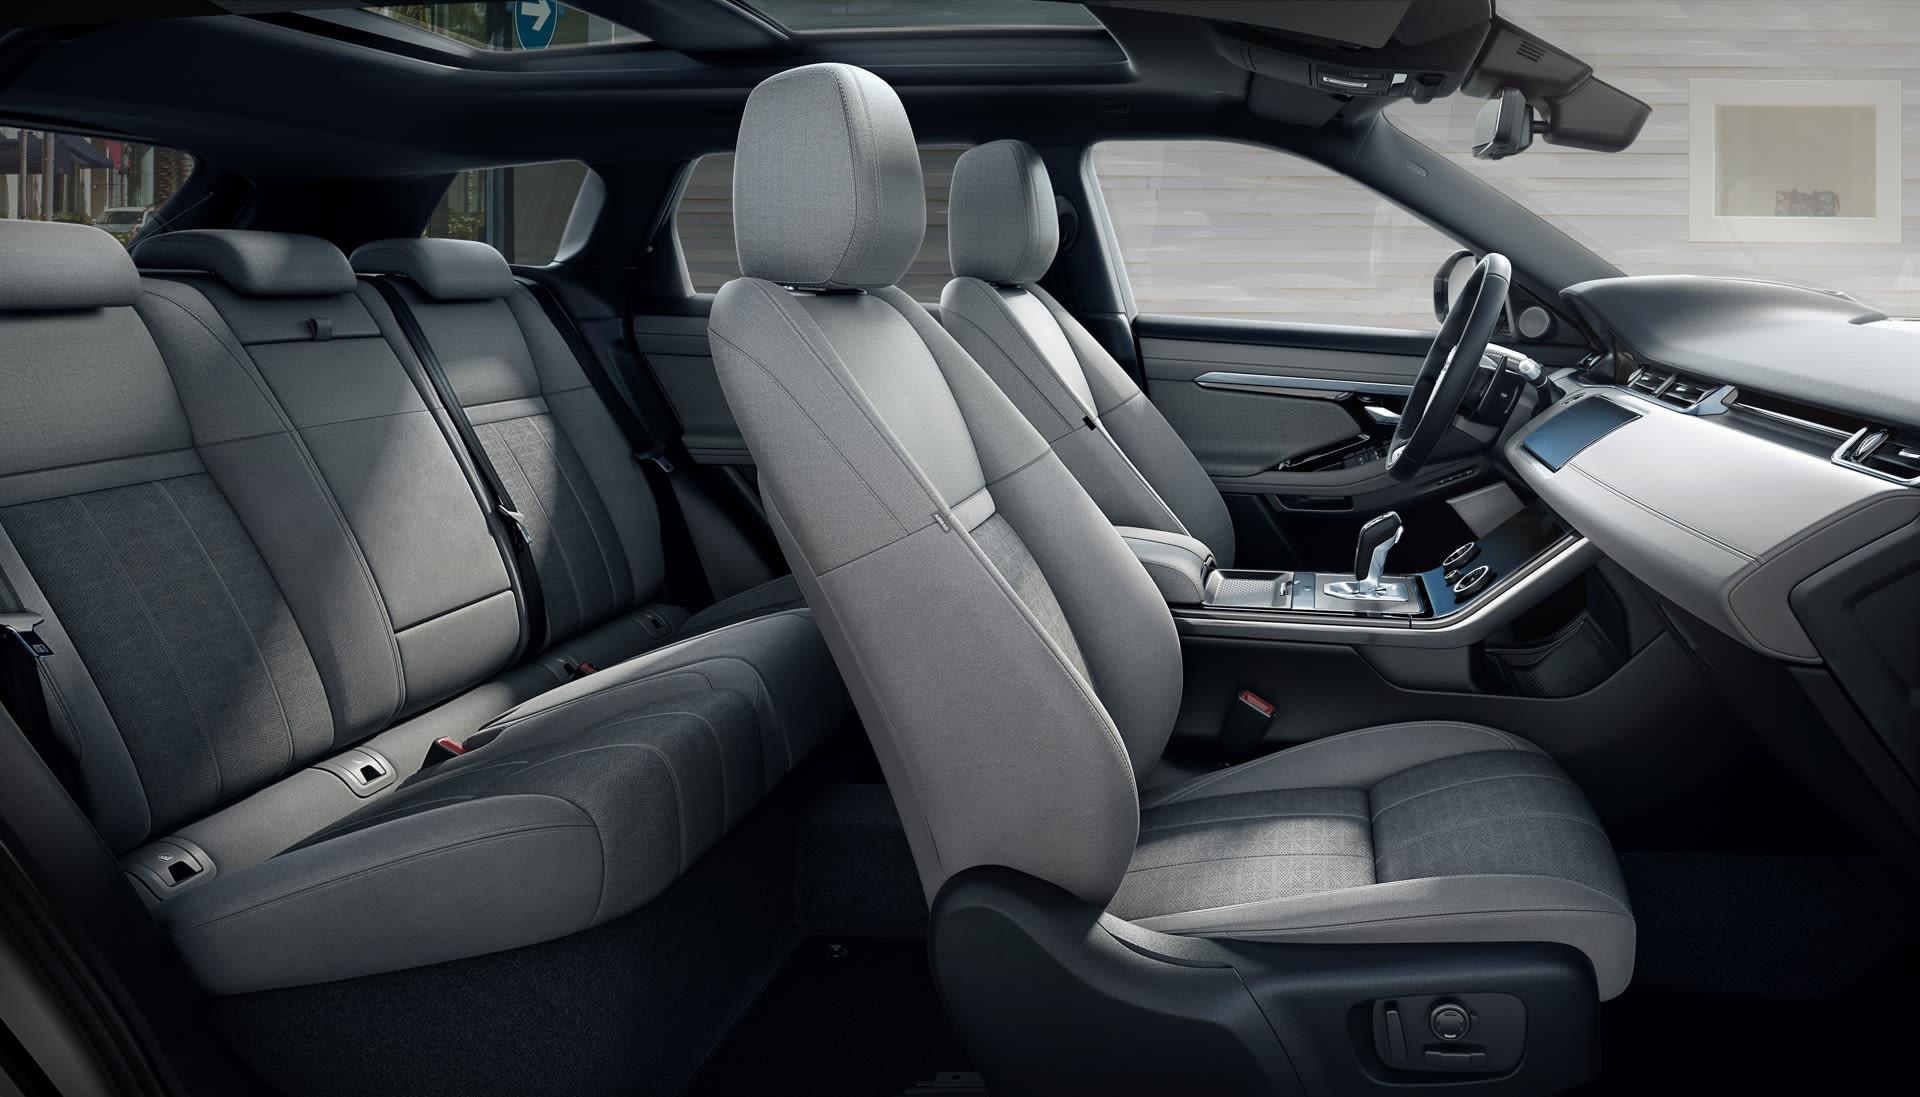 Land Rover Evoque first drive